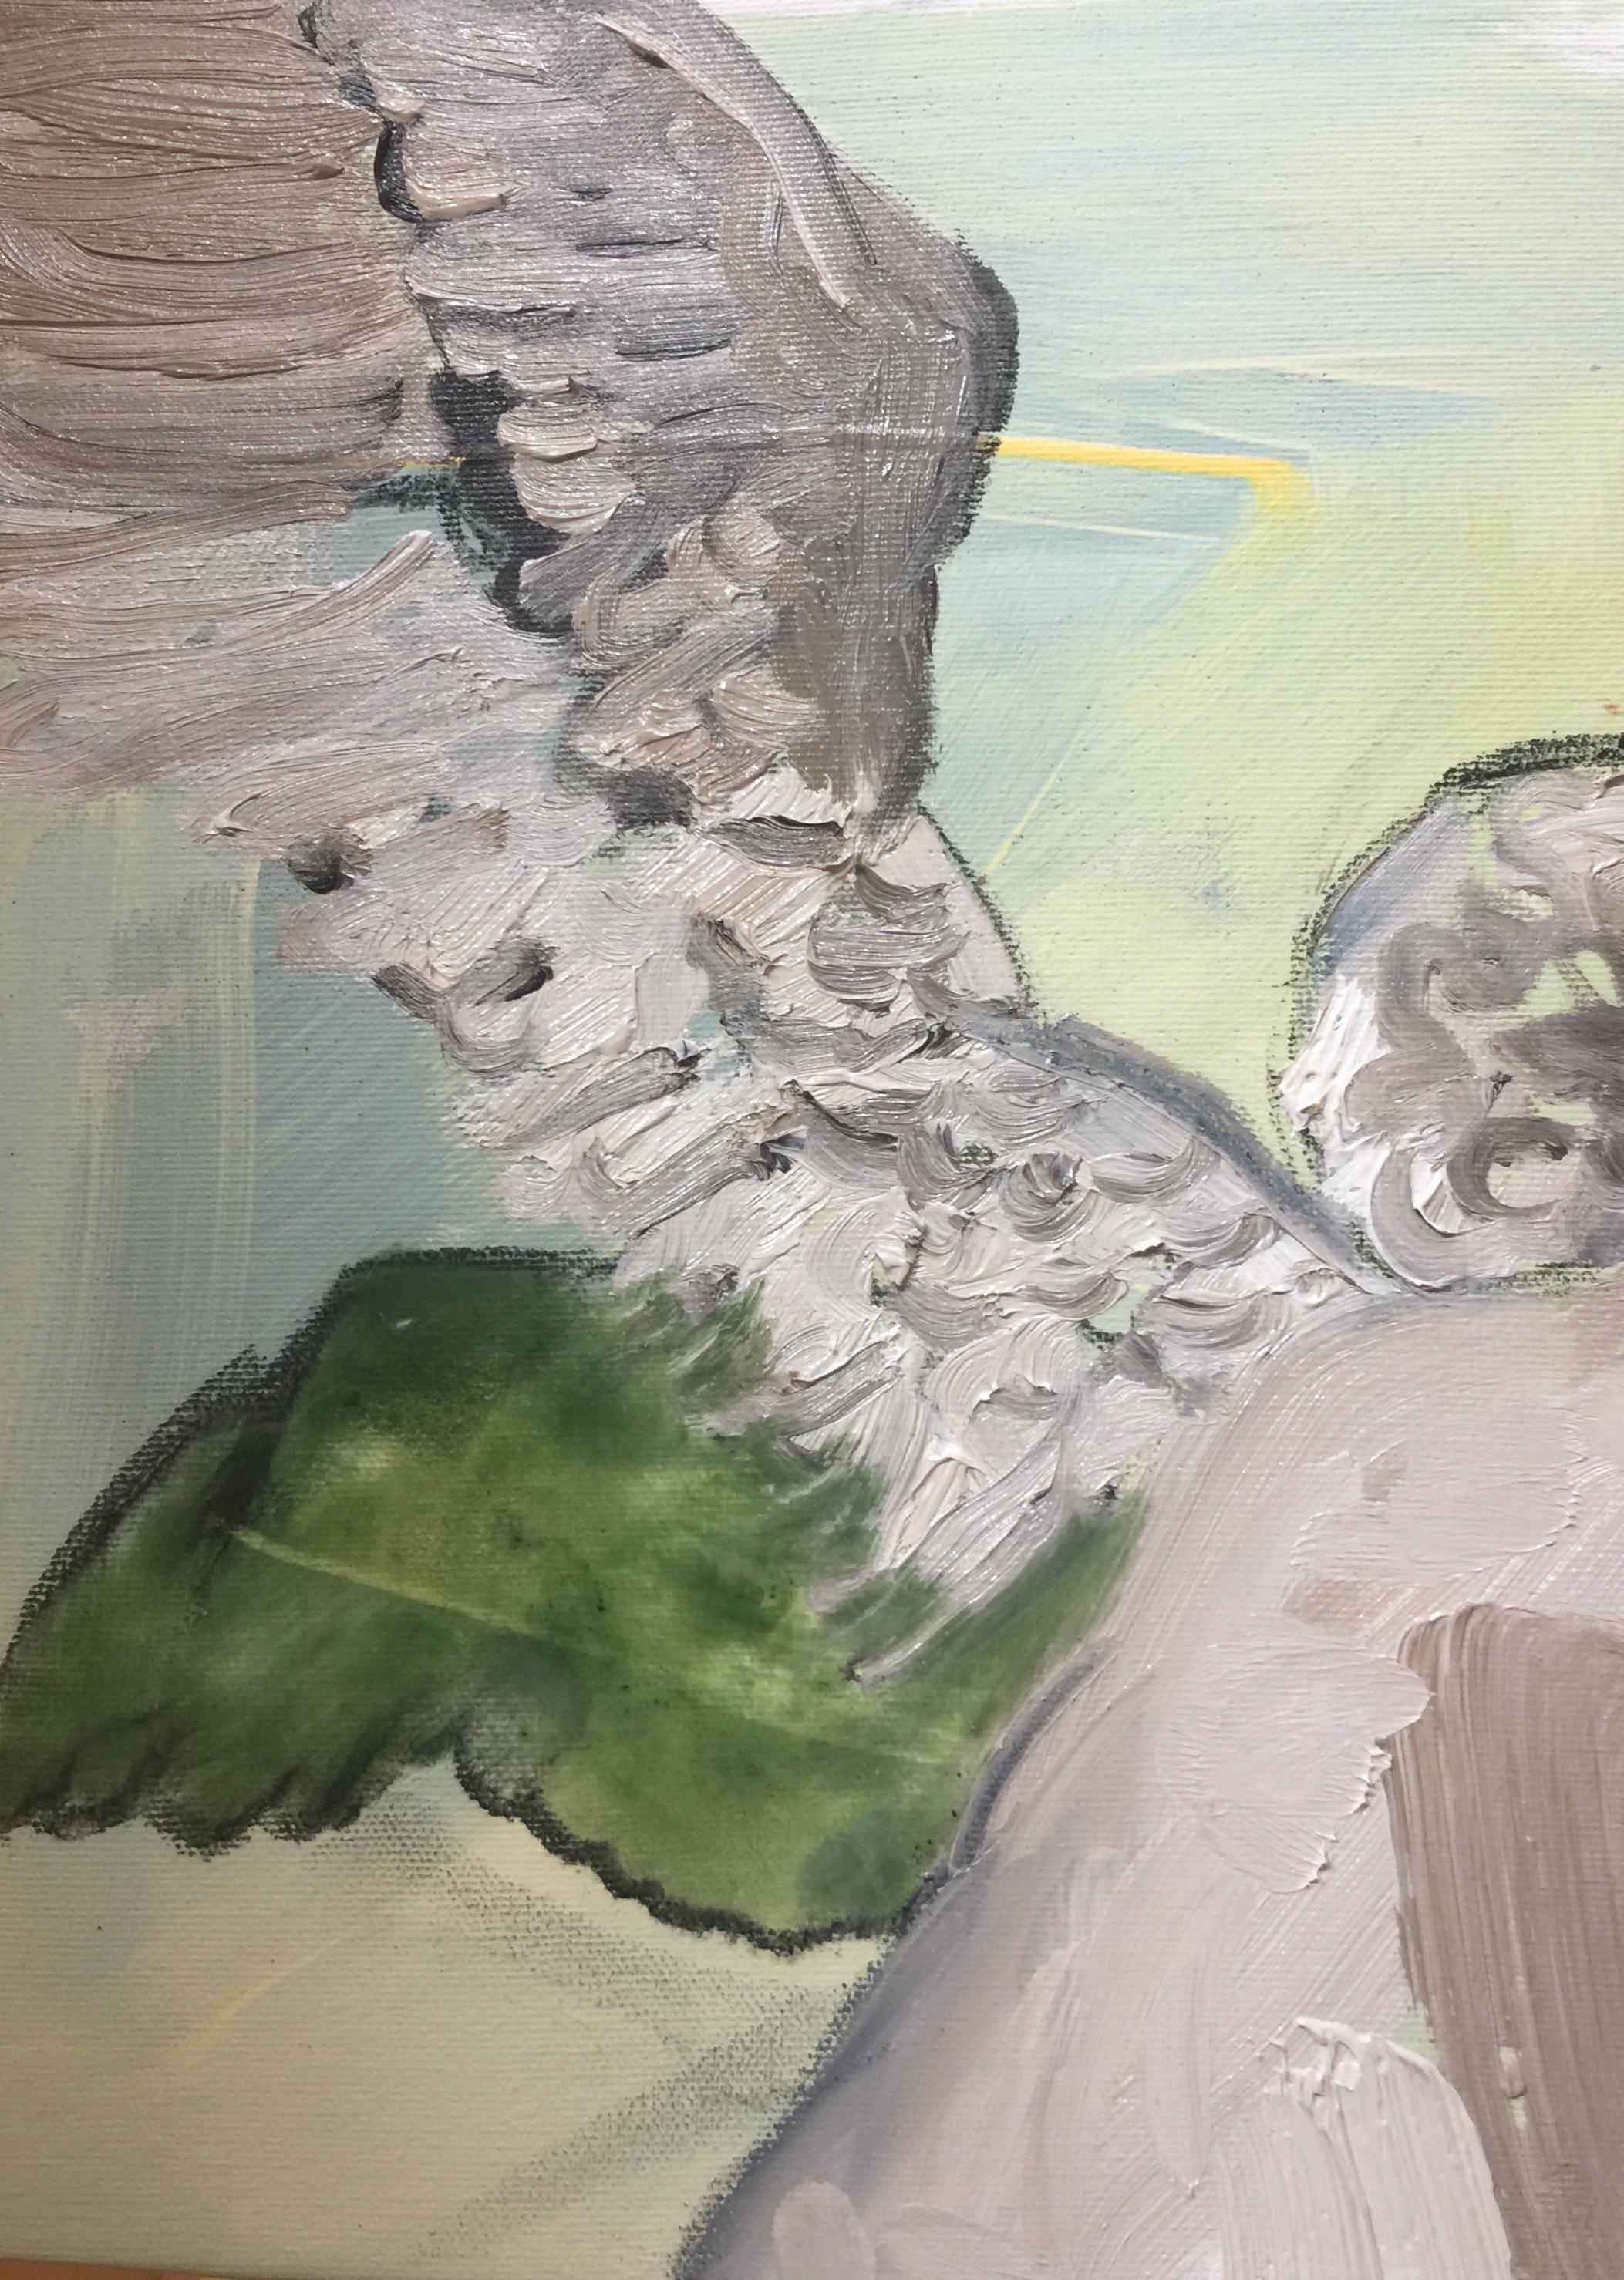 Patti Smith Land 250: Cupidon, L'Hermitage, St. Petersburg.